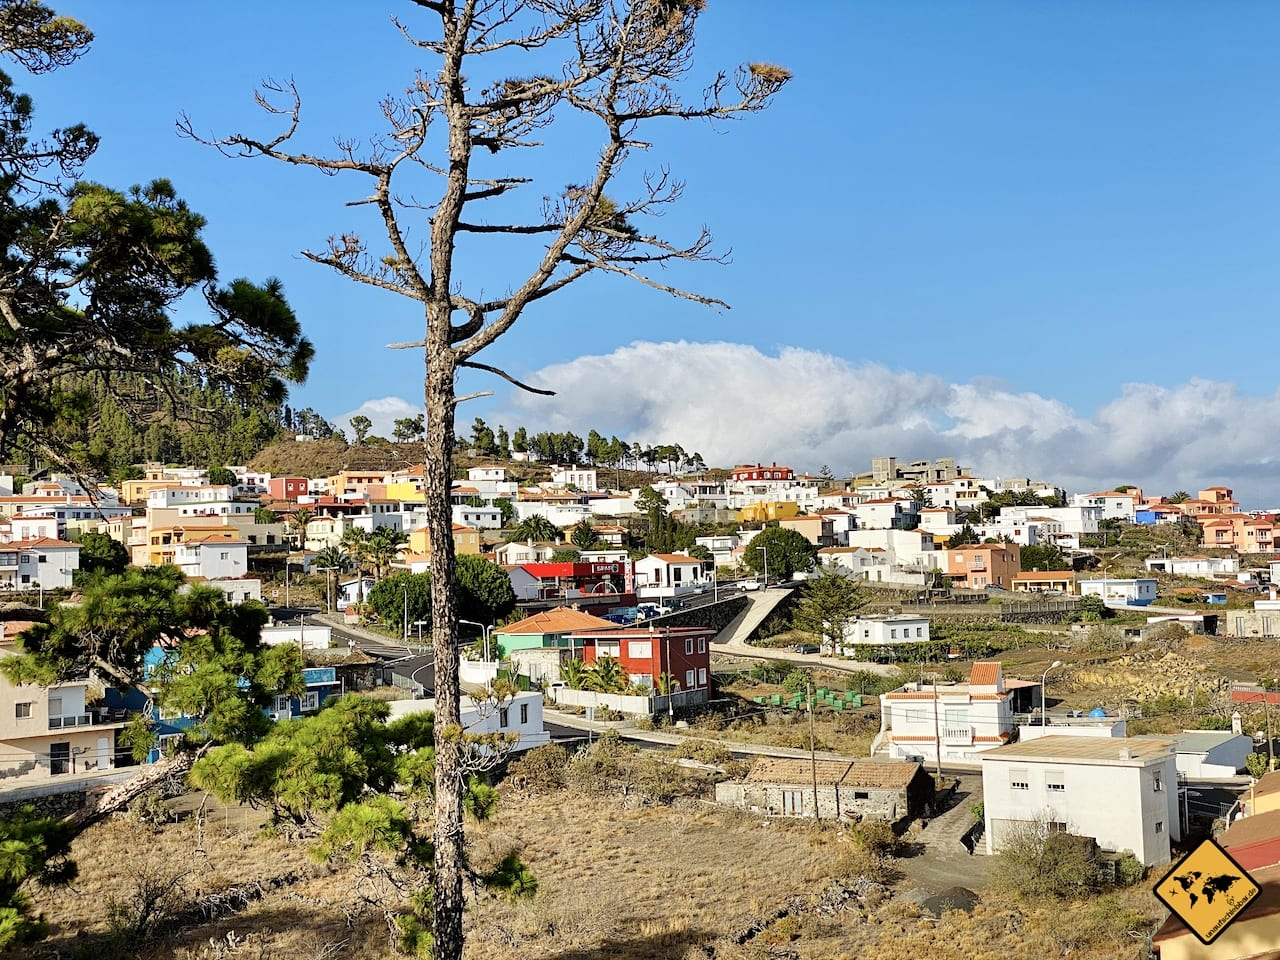 La Palma Fuencaliente